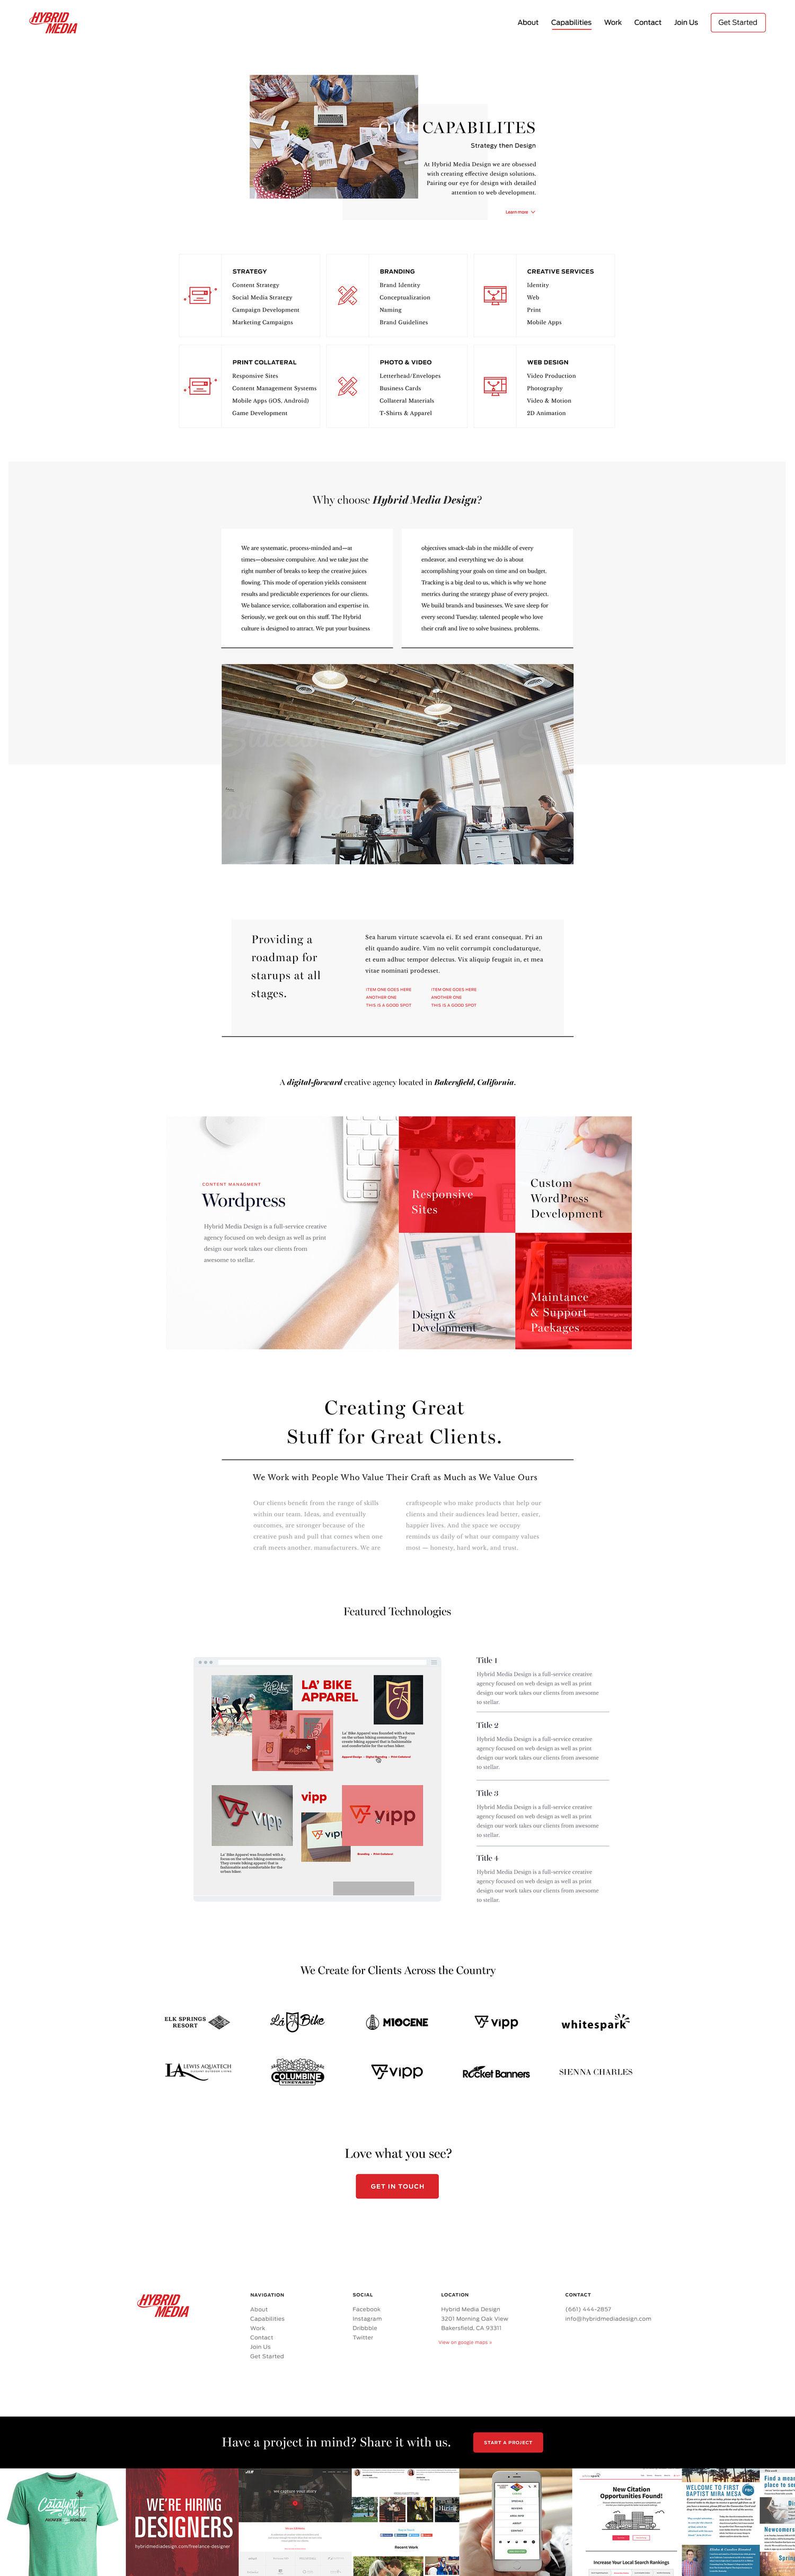 Web Design | Hybrid Media - Capabilities (Desktop View)